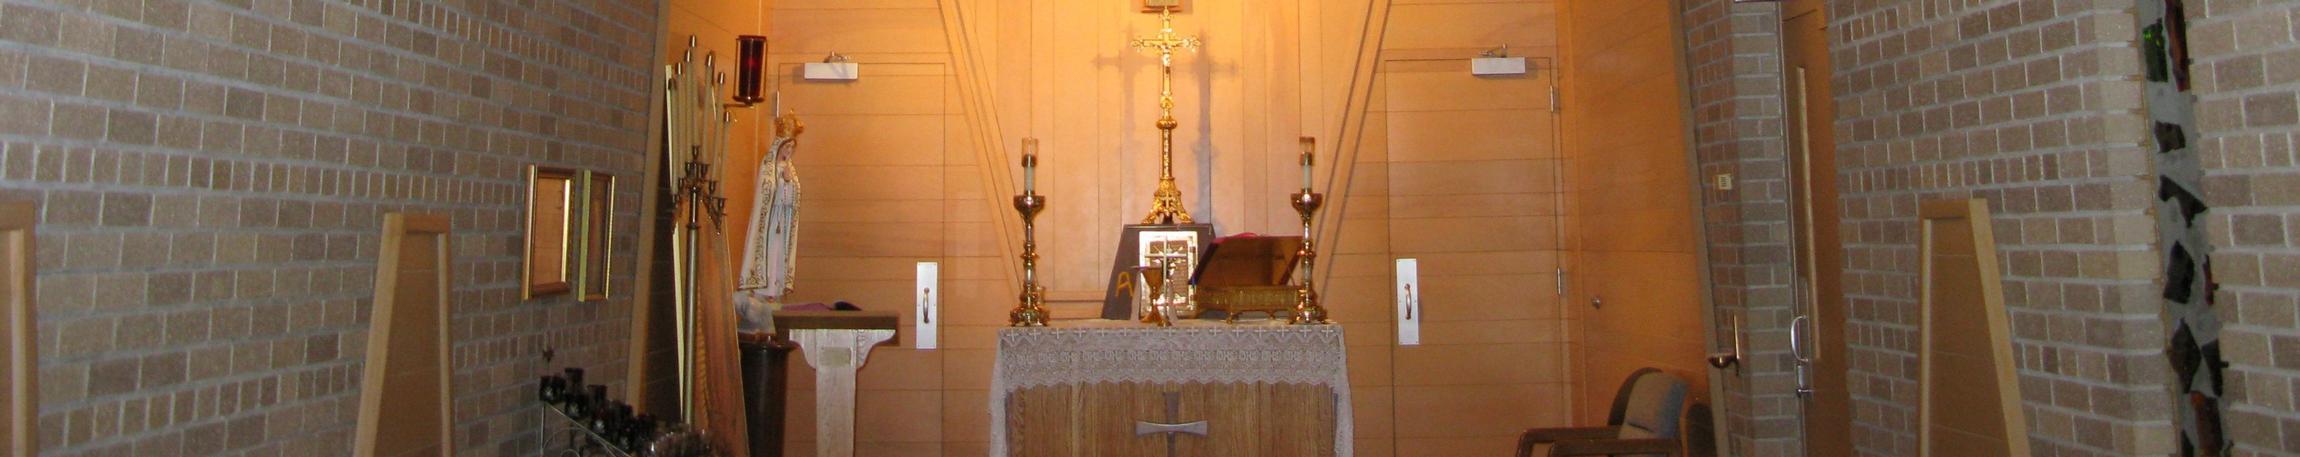 Liturgy Page